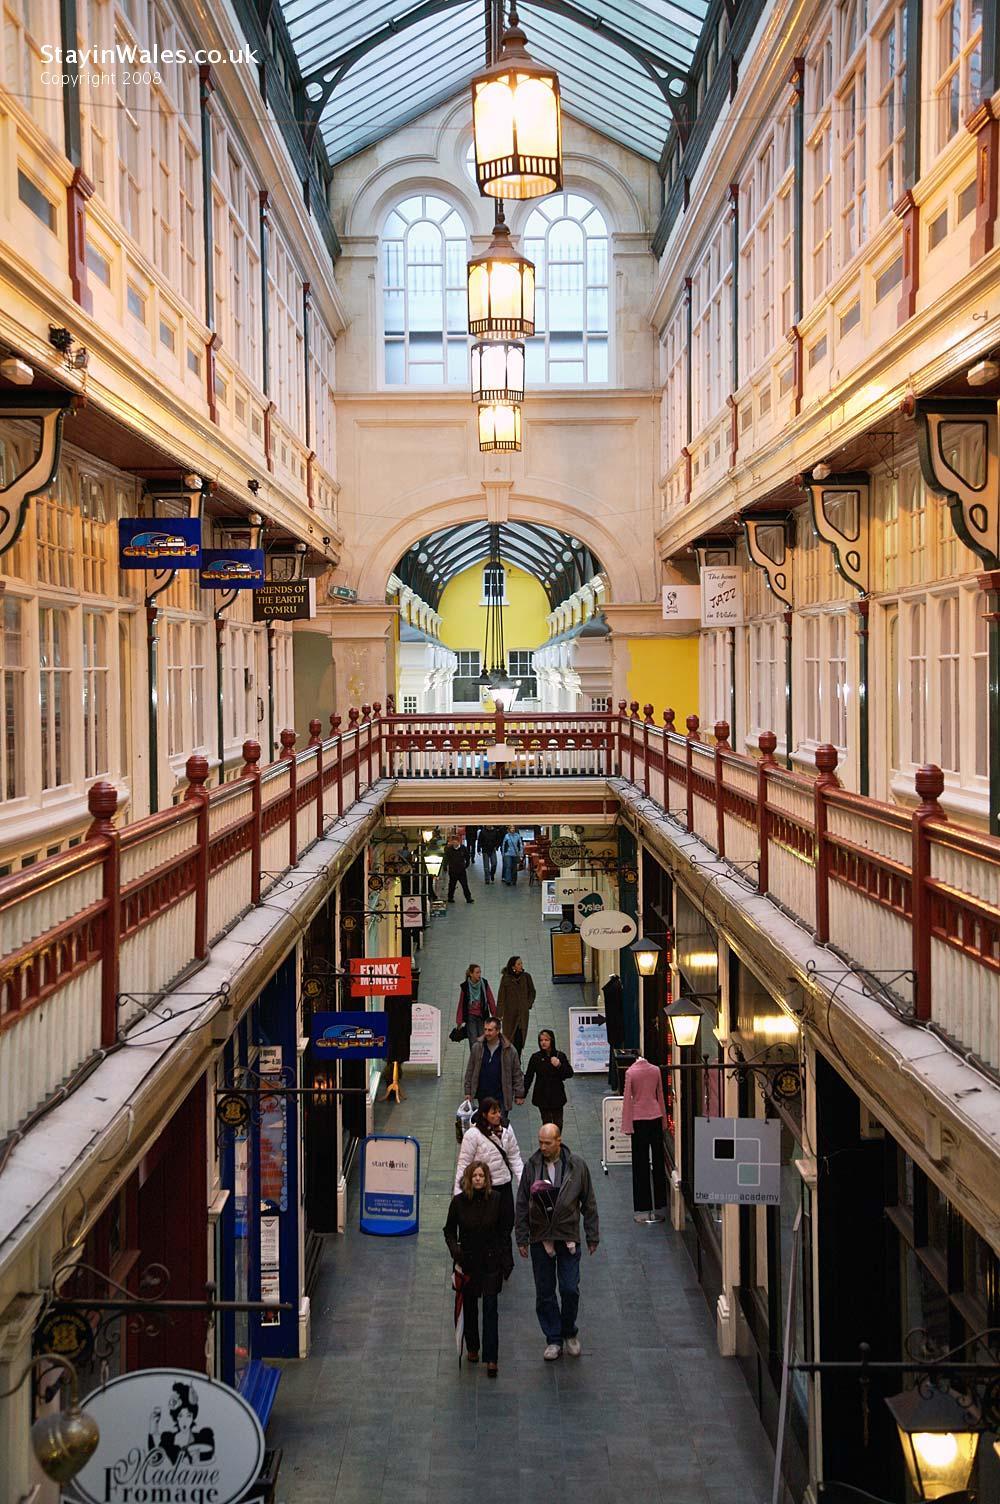 Castle Arcade, Cardiff